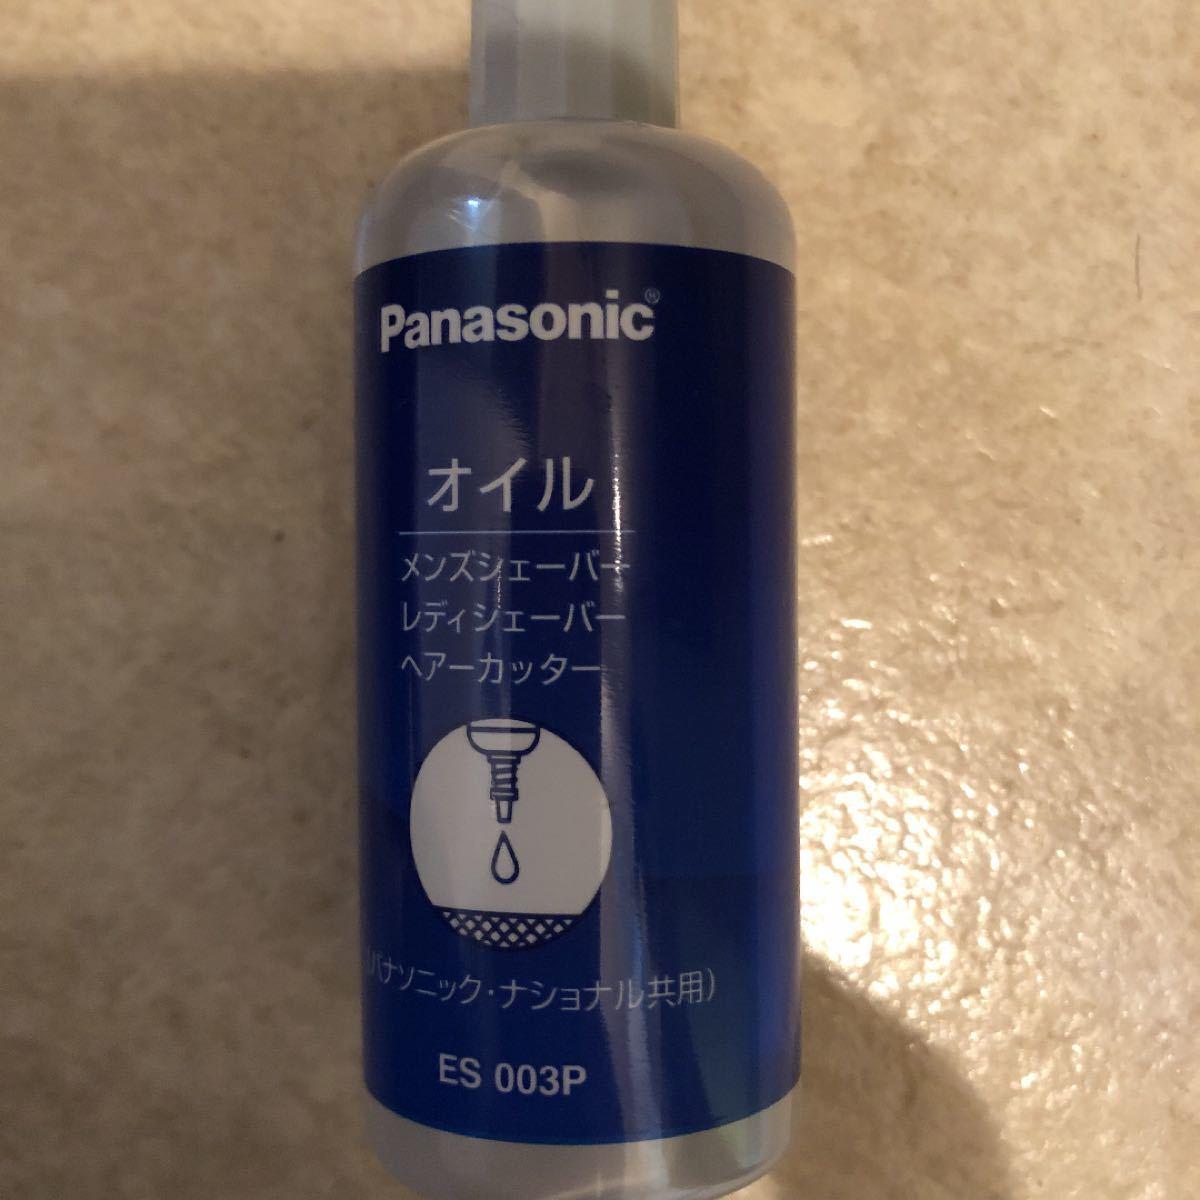 Panasonic ER-GF80